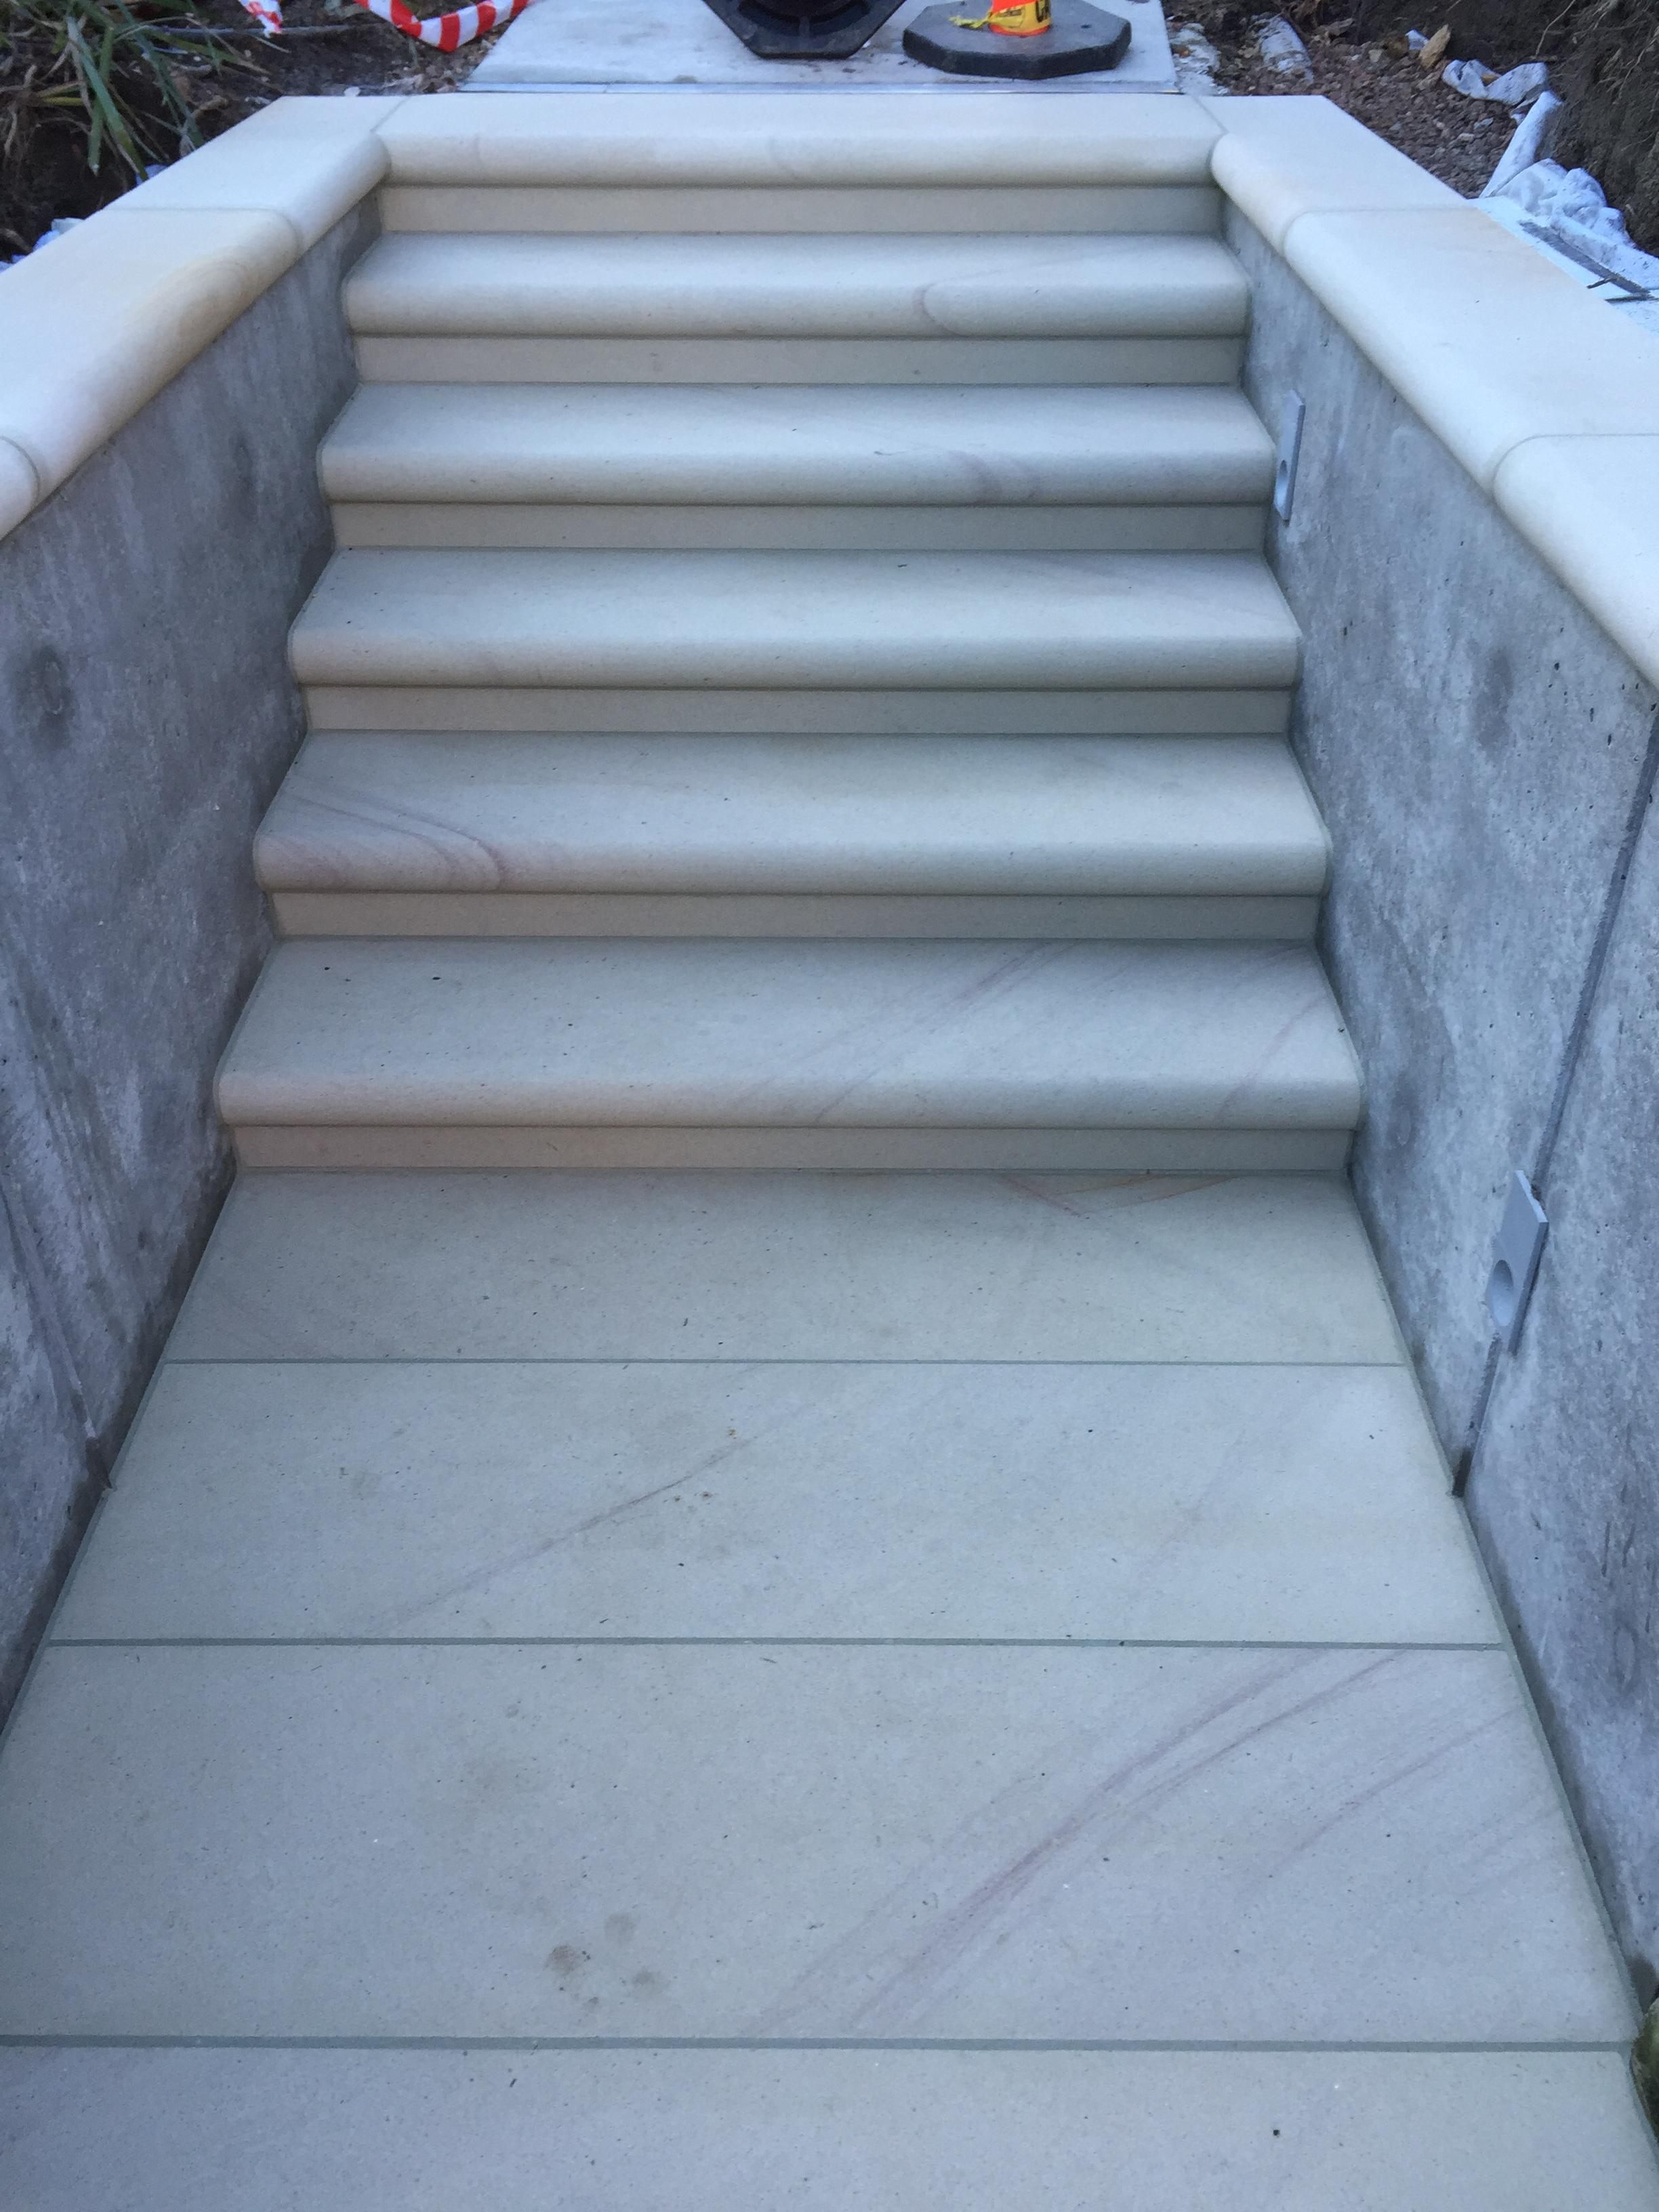 White-very light pink steps pavers bullnosed- elite stonemasons Woolstonecraft project (1).JPG